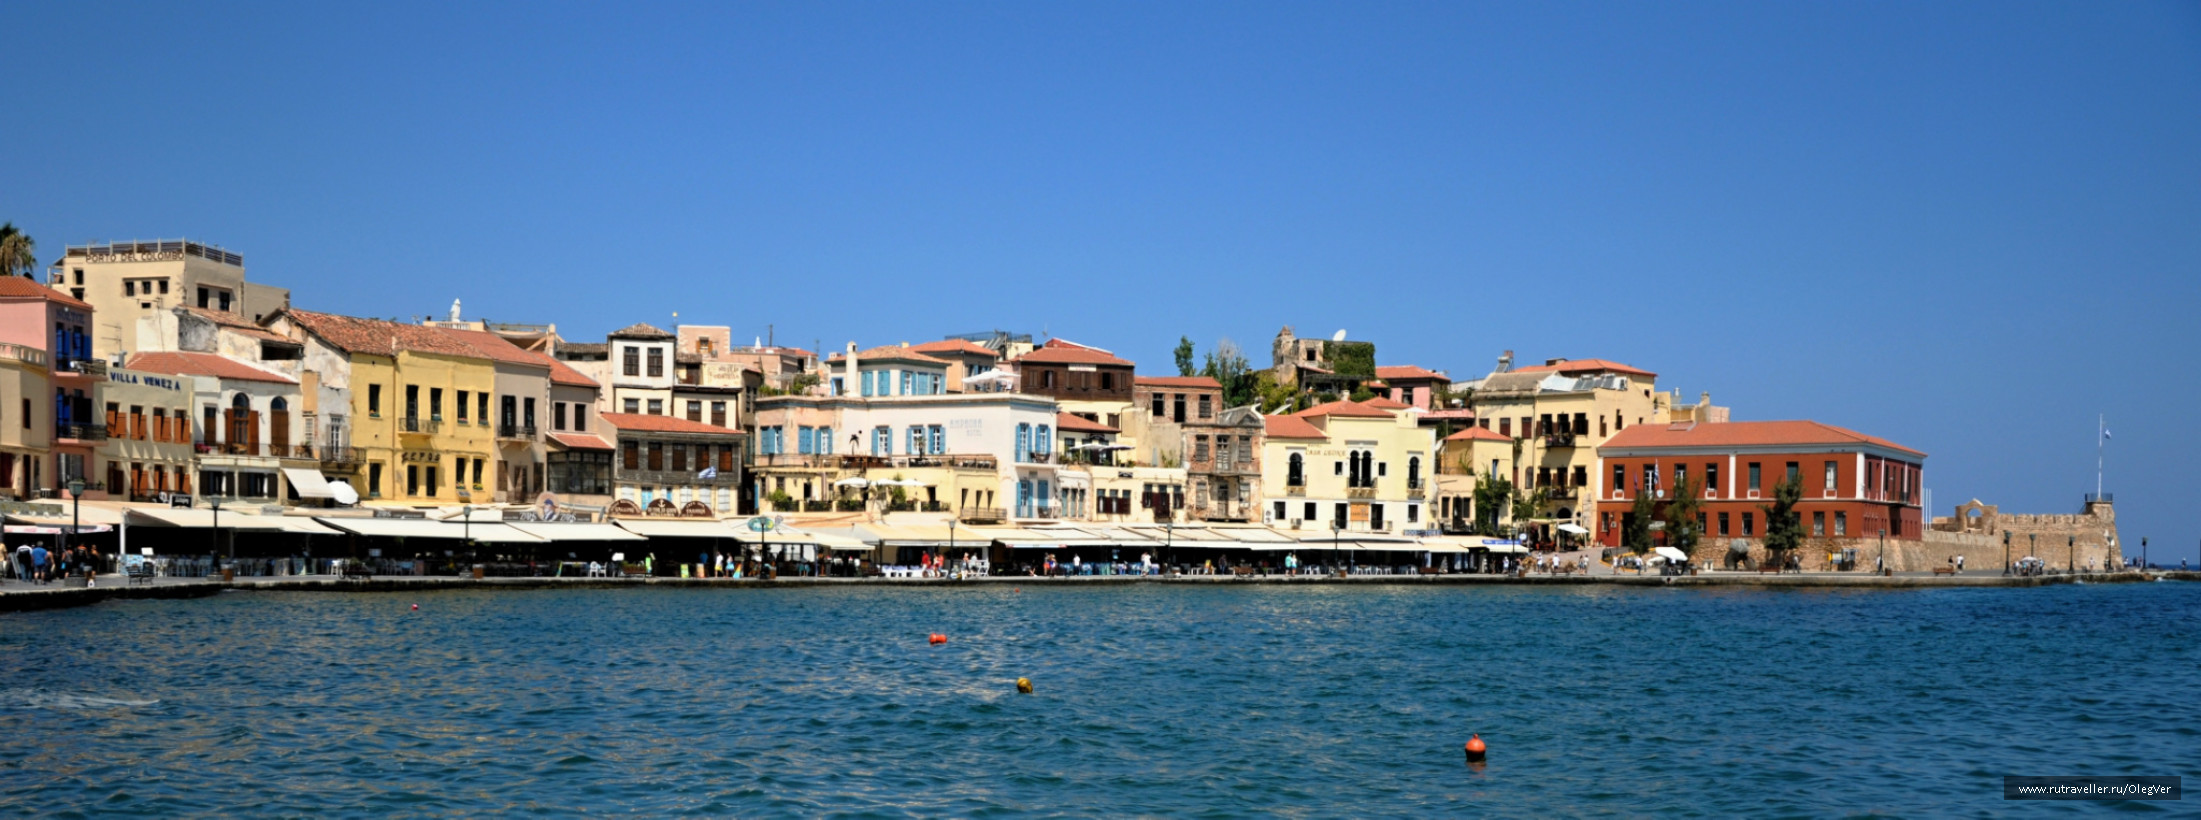 Венецианкая гавань Ханьи